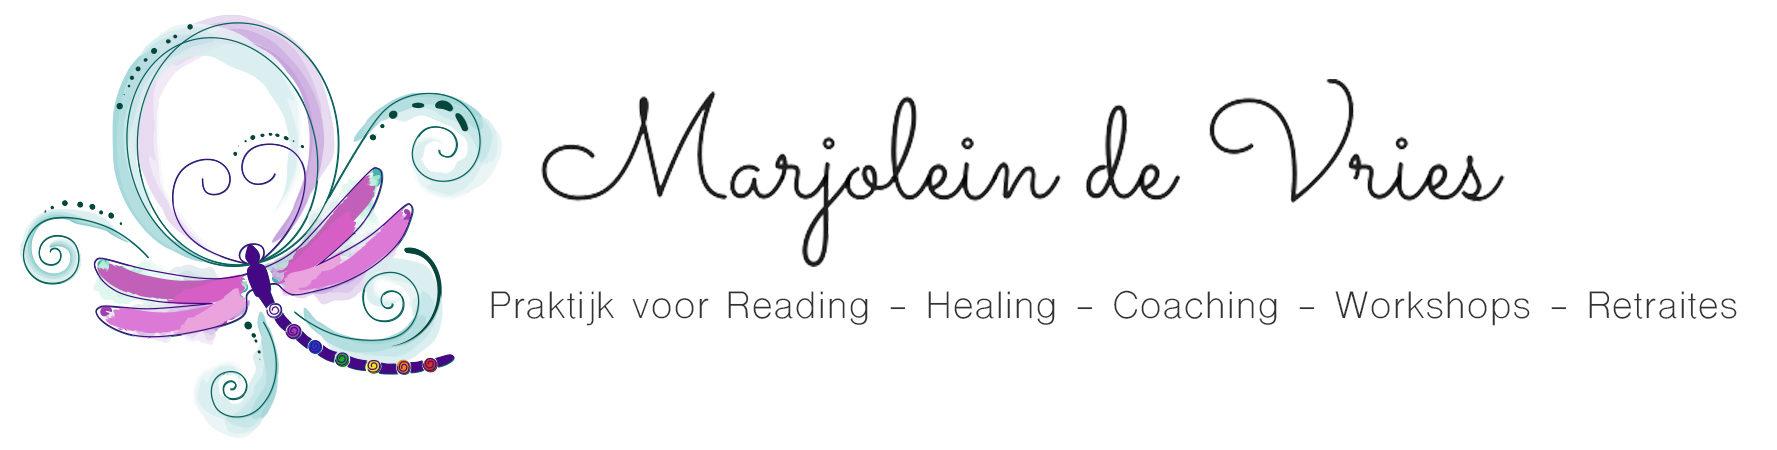 Praktijk Marjolein de Vries